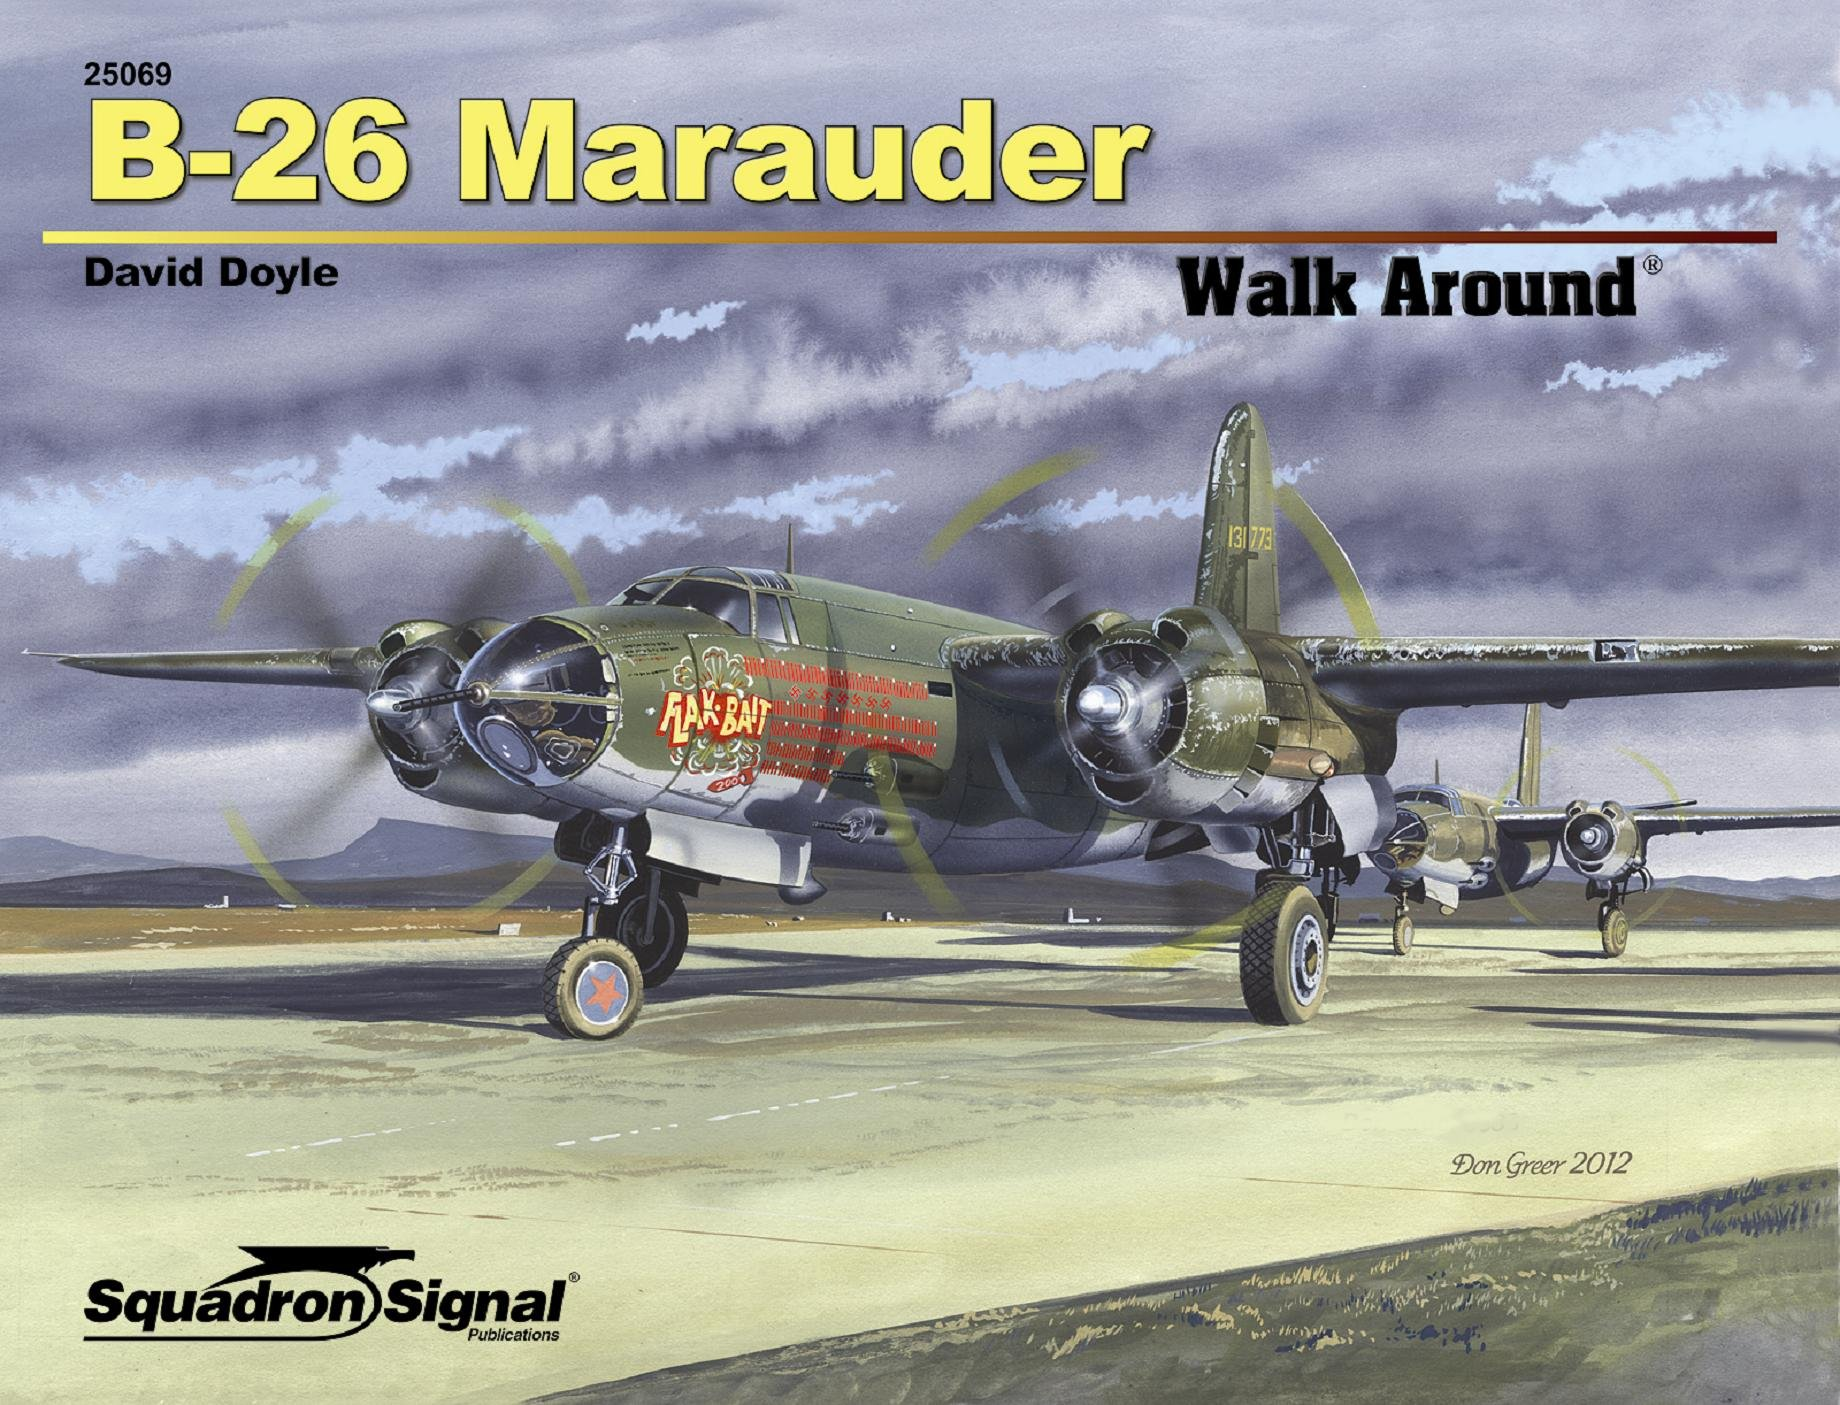 b 26 marauder amazon A -26 Bomber b 26 marauder walk around 25069